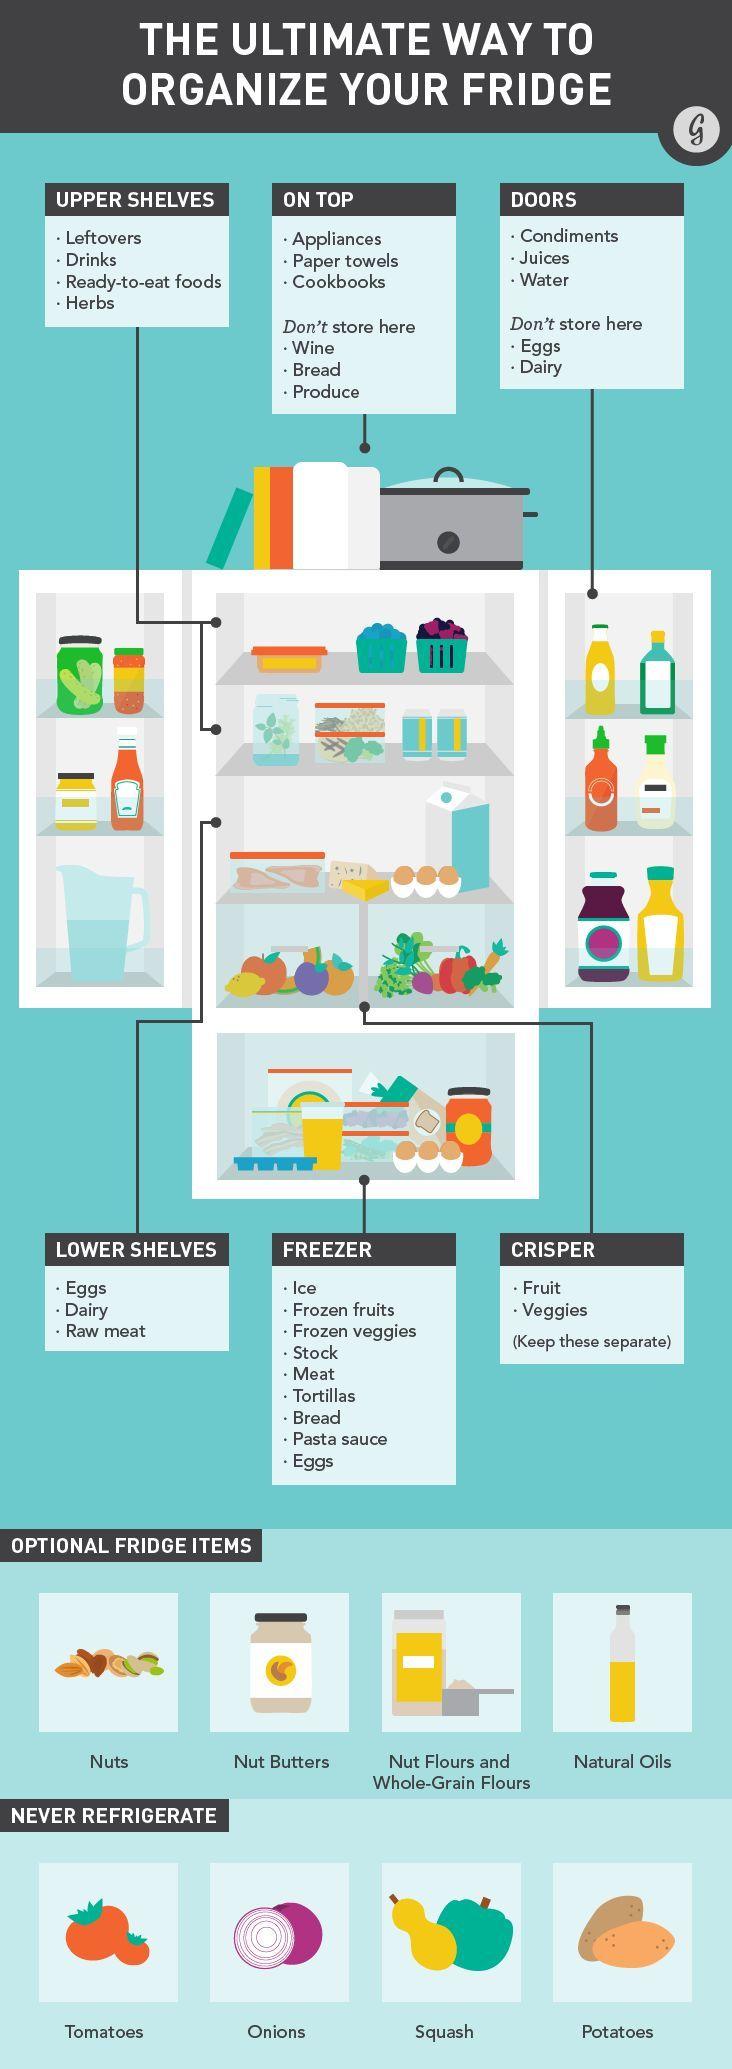 How to Organize Your Fridge to Make Food Taste Better and Last Longer #organization #wellness #fridge